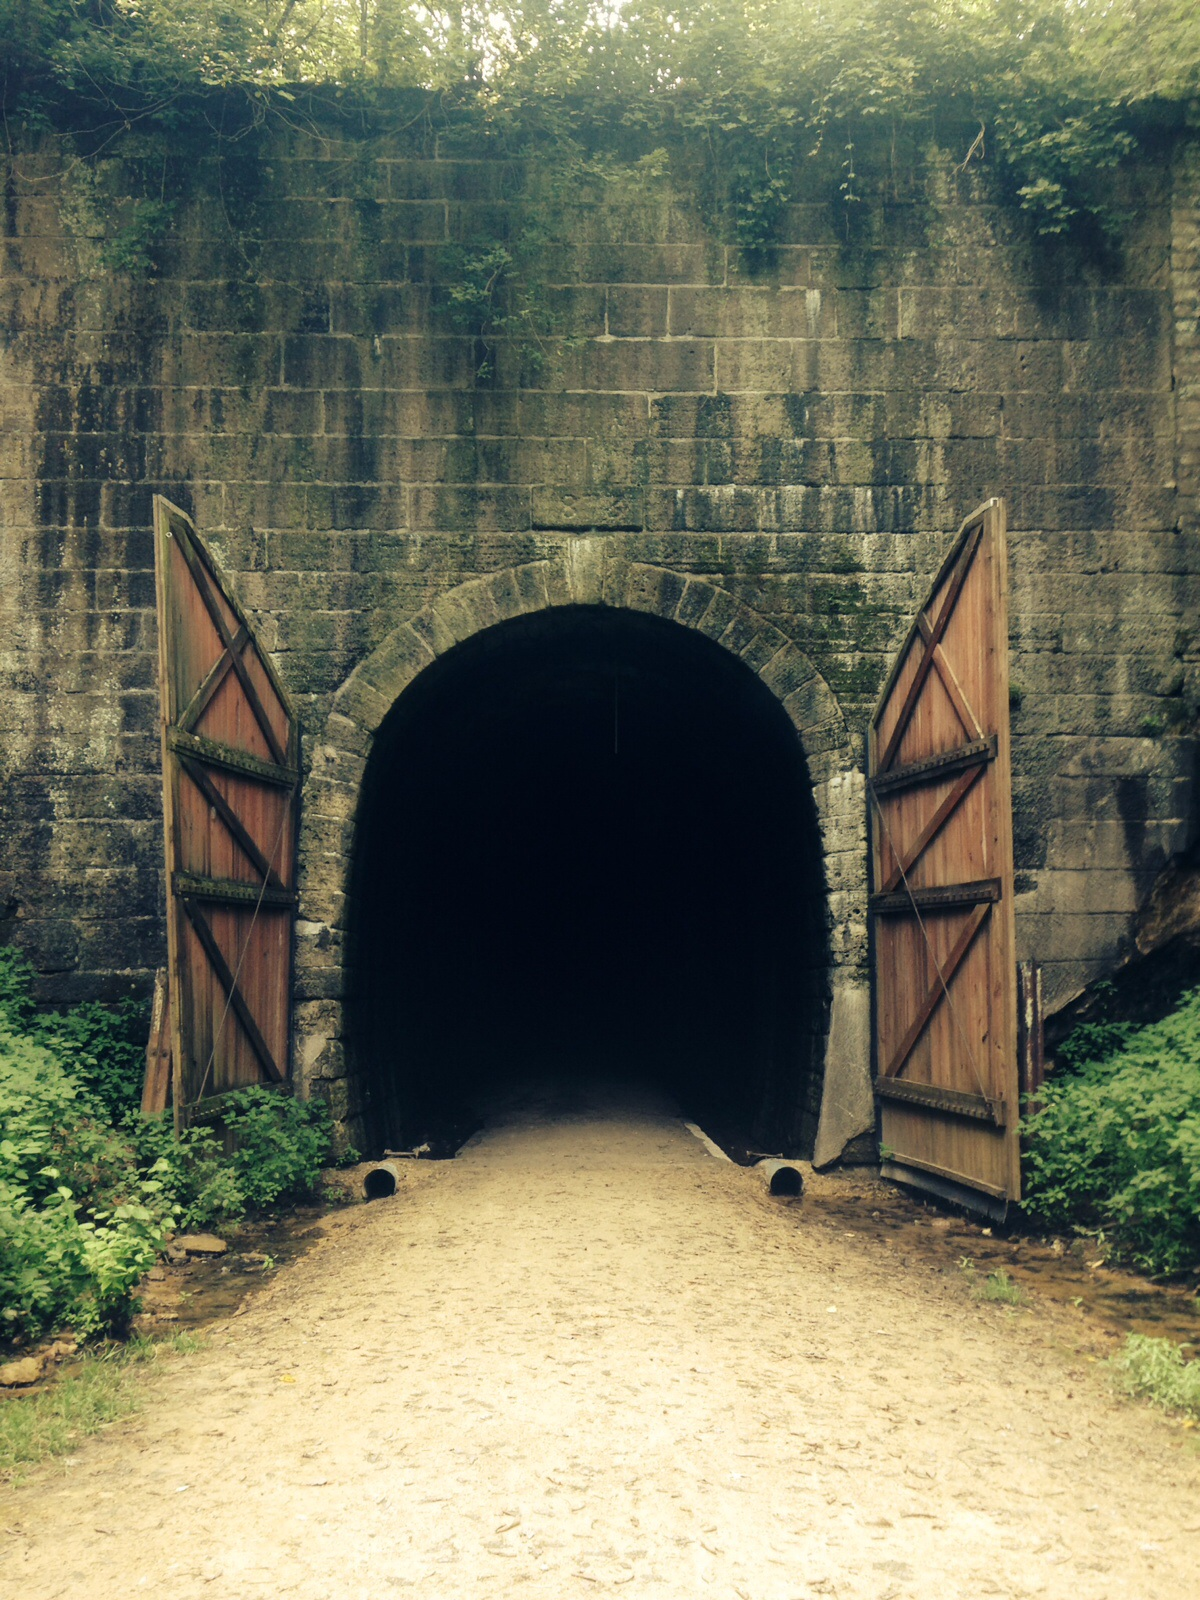 """Abandon all hope, ye who enter here..."""